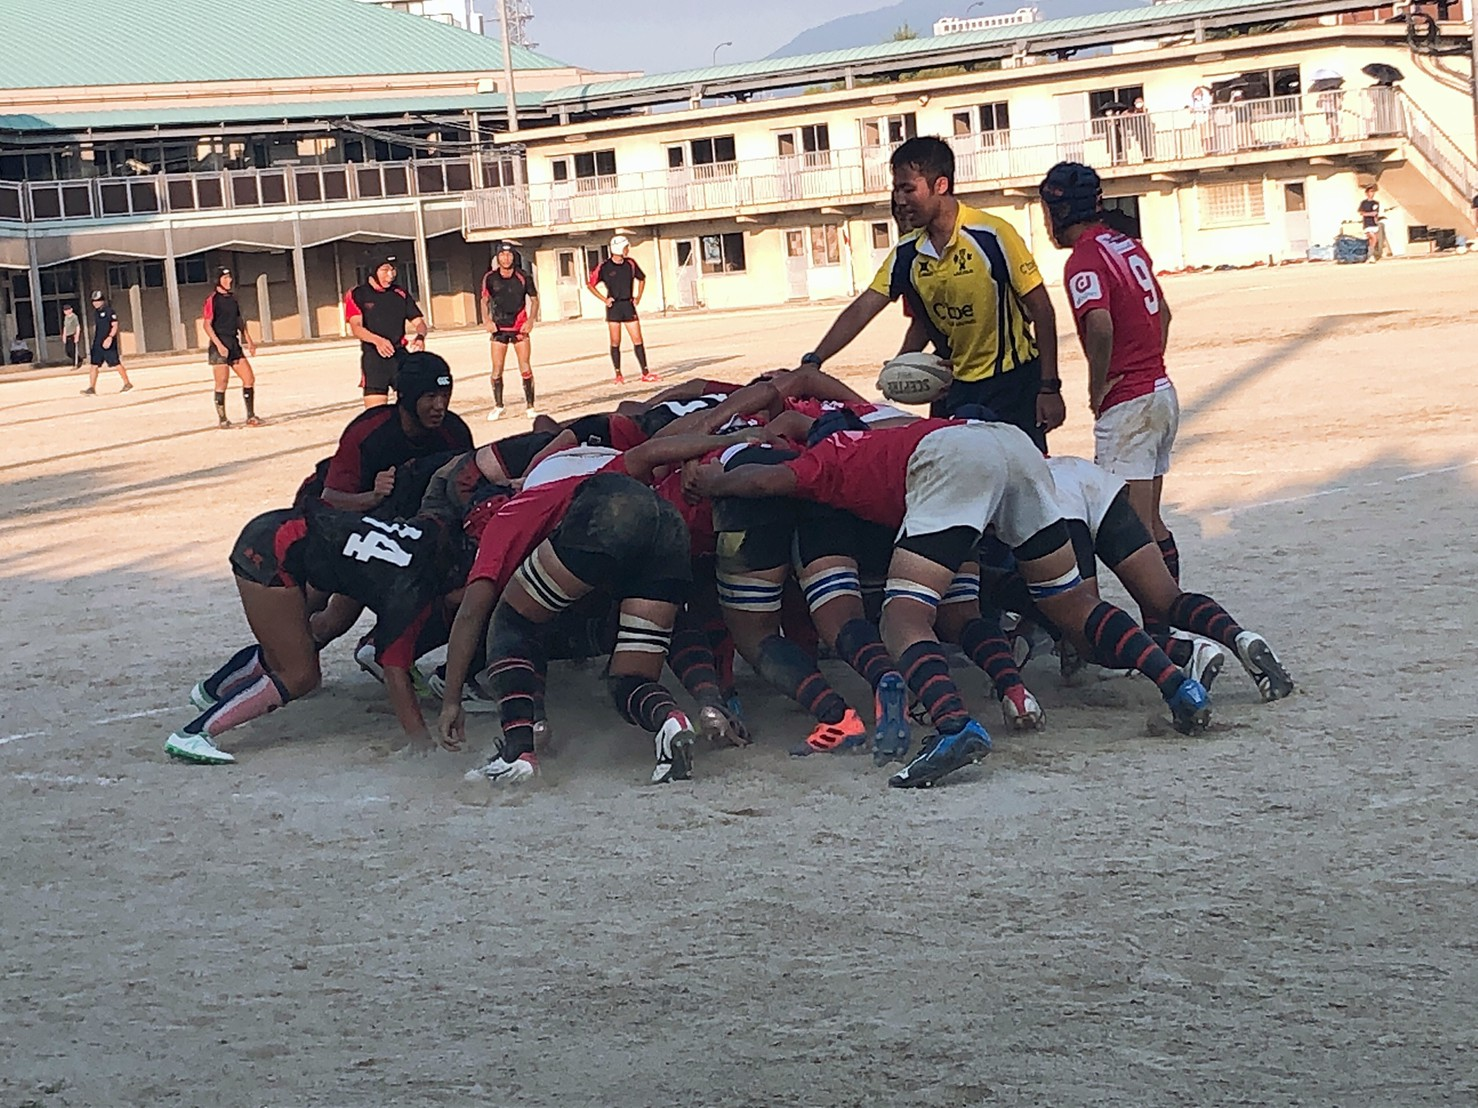 http://kokura-rugby.sakura.ne.jp/line_1657669420666407.jpg